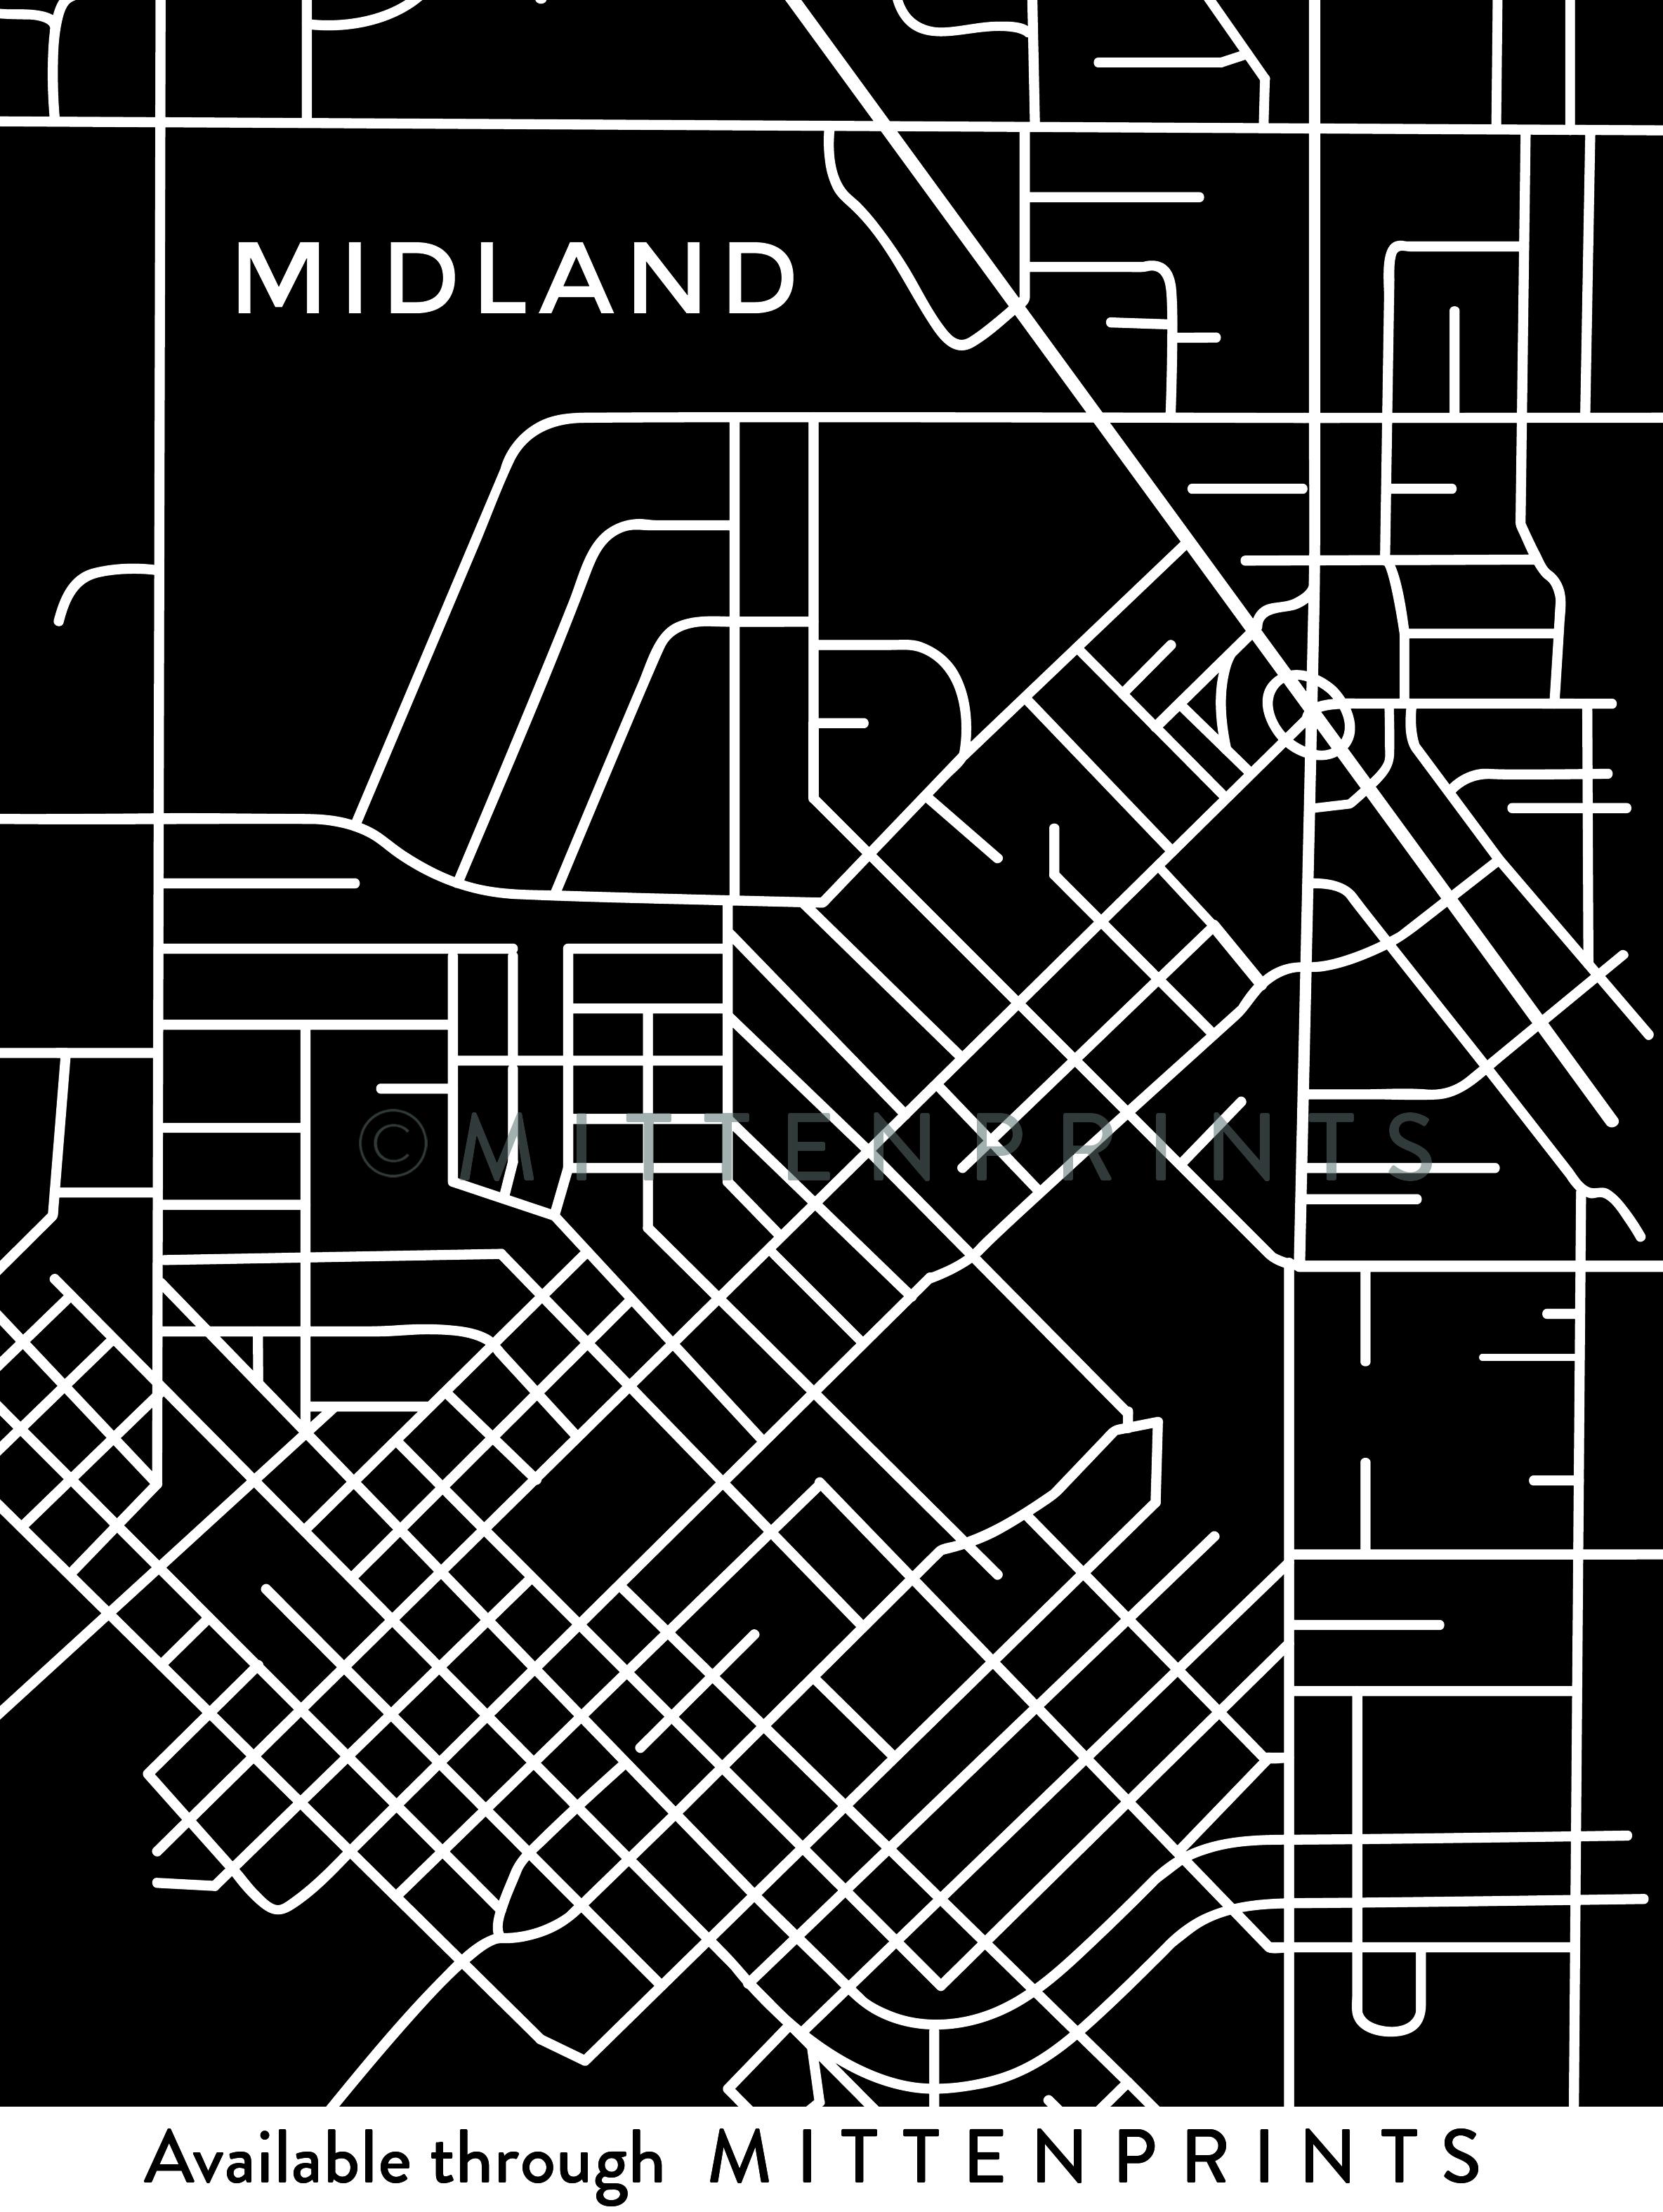 Midland Map BLACK P-01.jpg